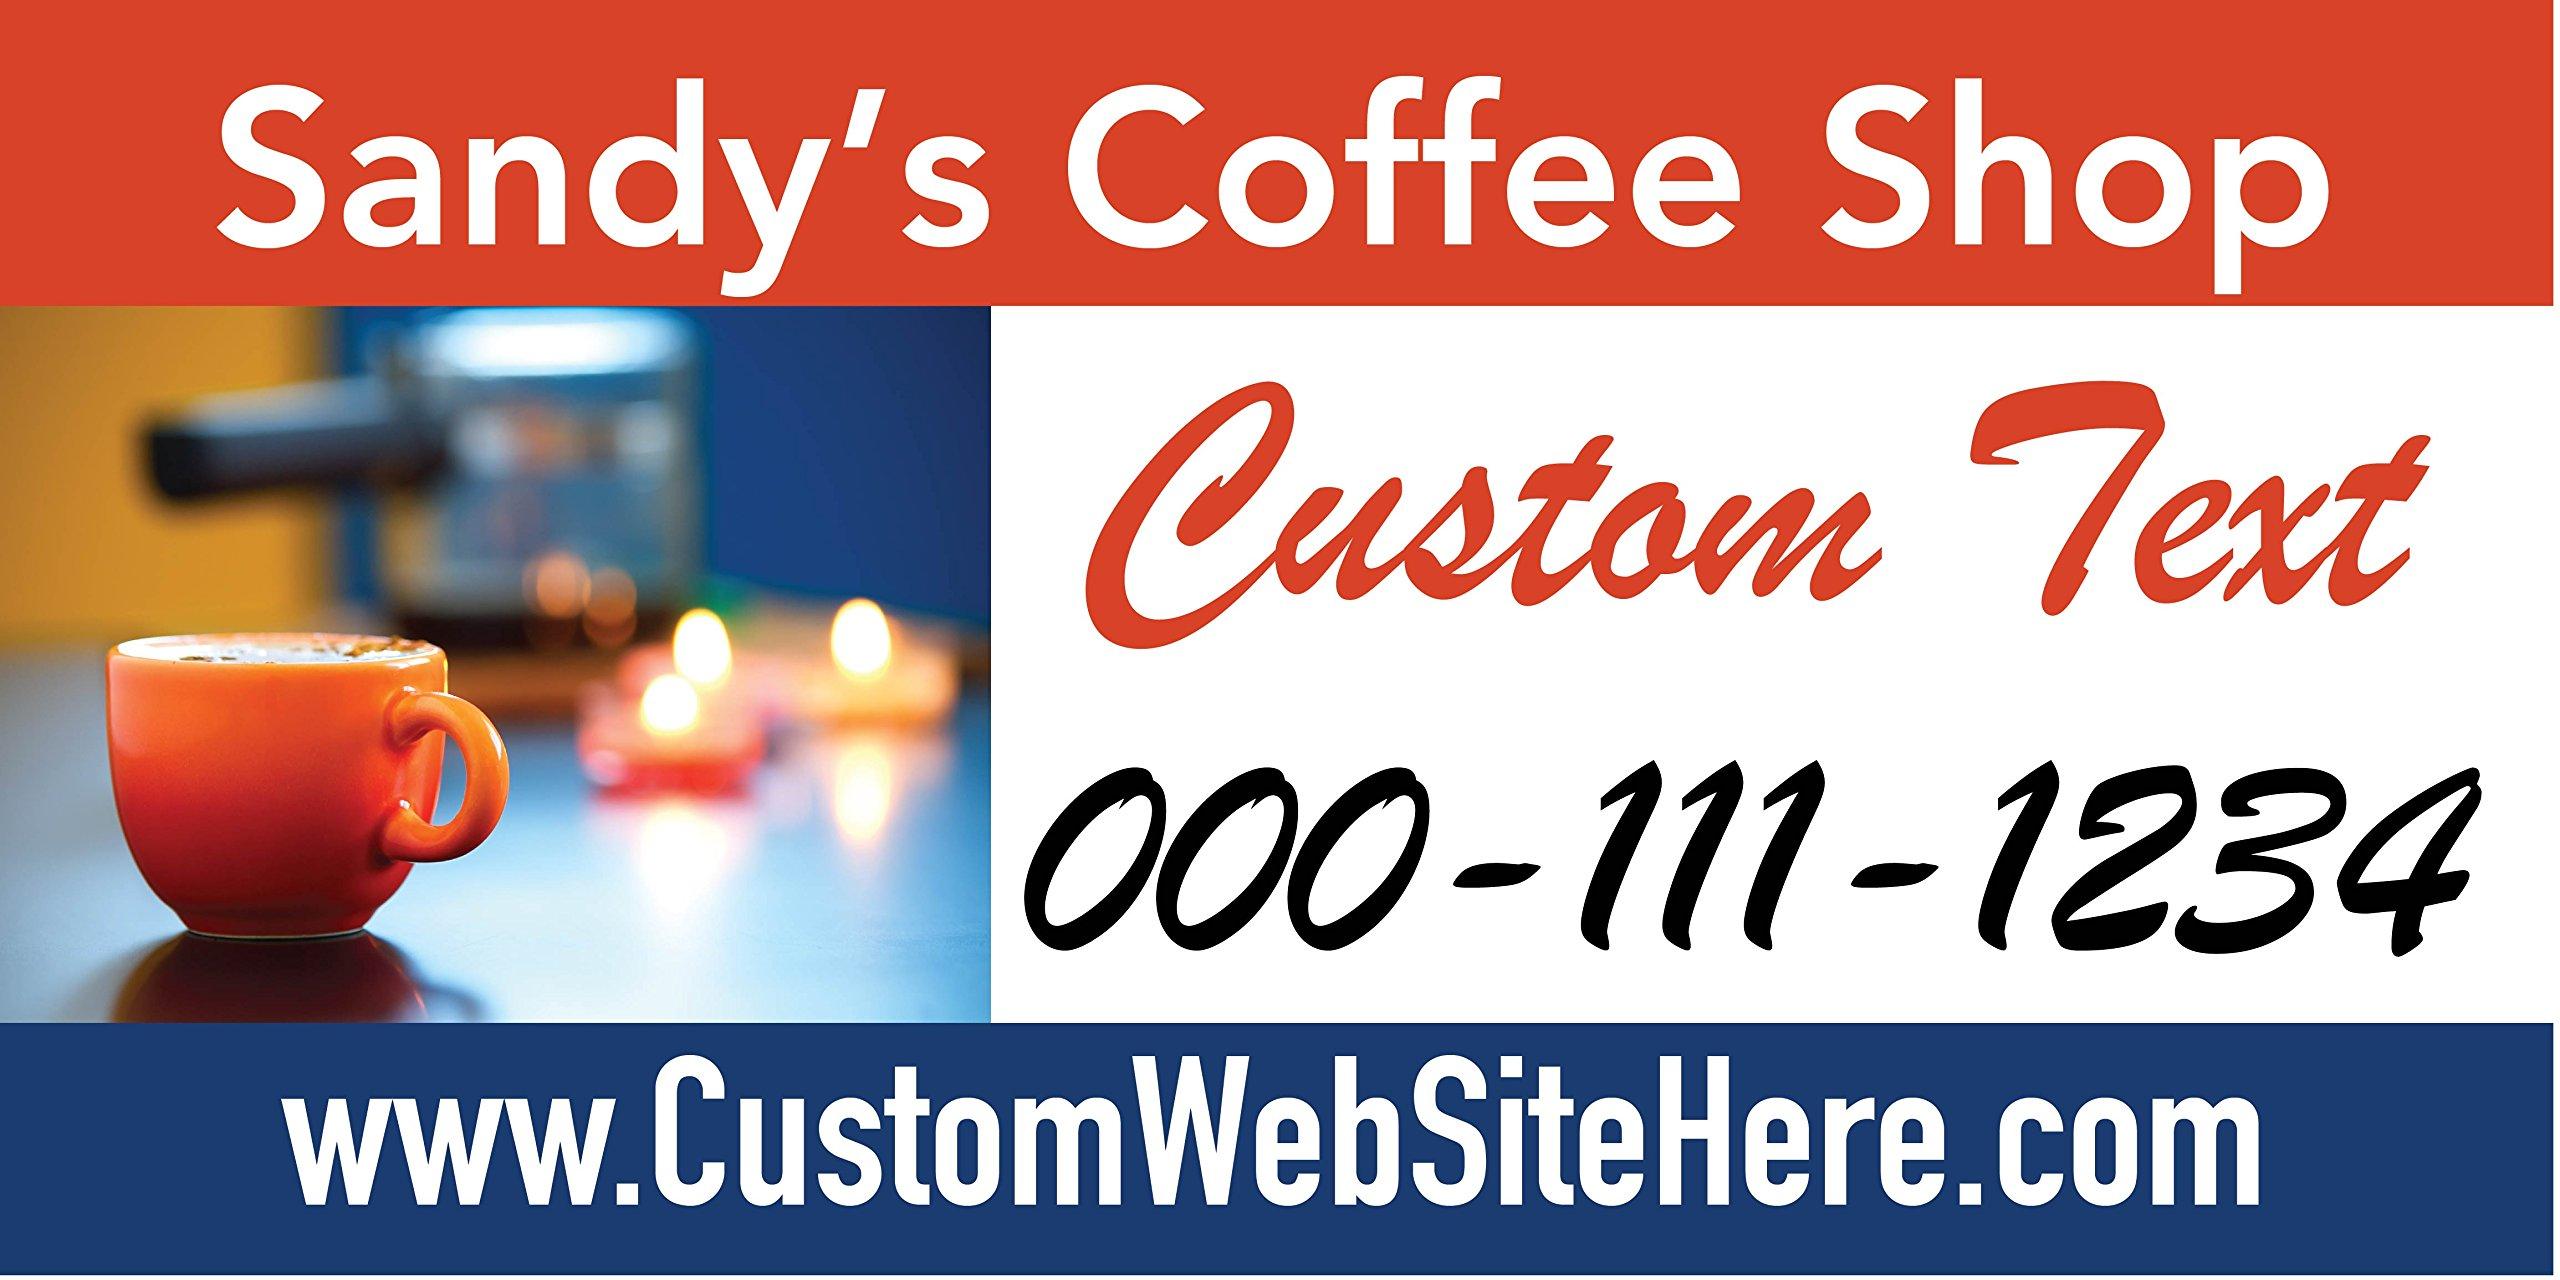 Custom Printed Coffee Shop Banner - Cup (10' x 5')